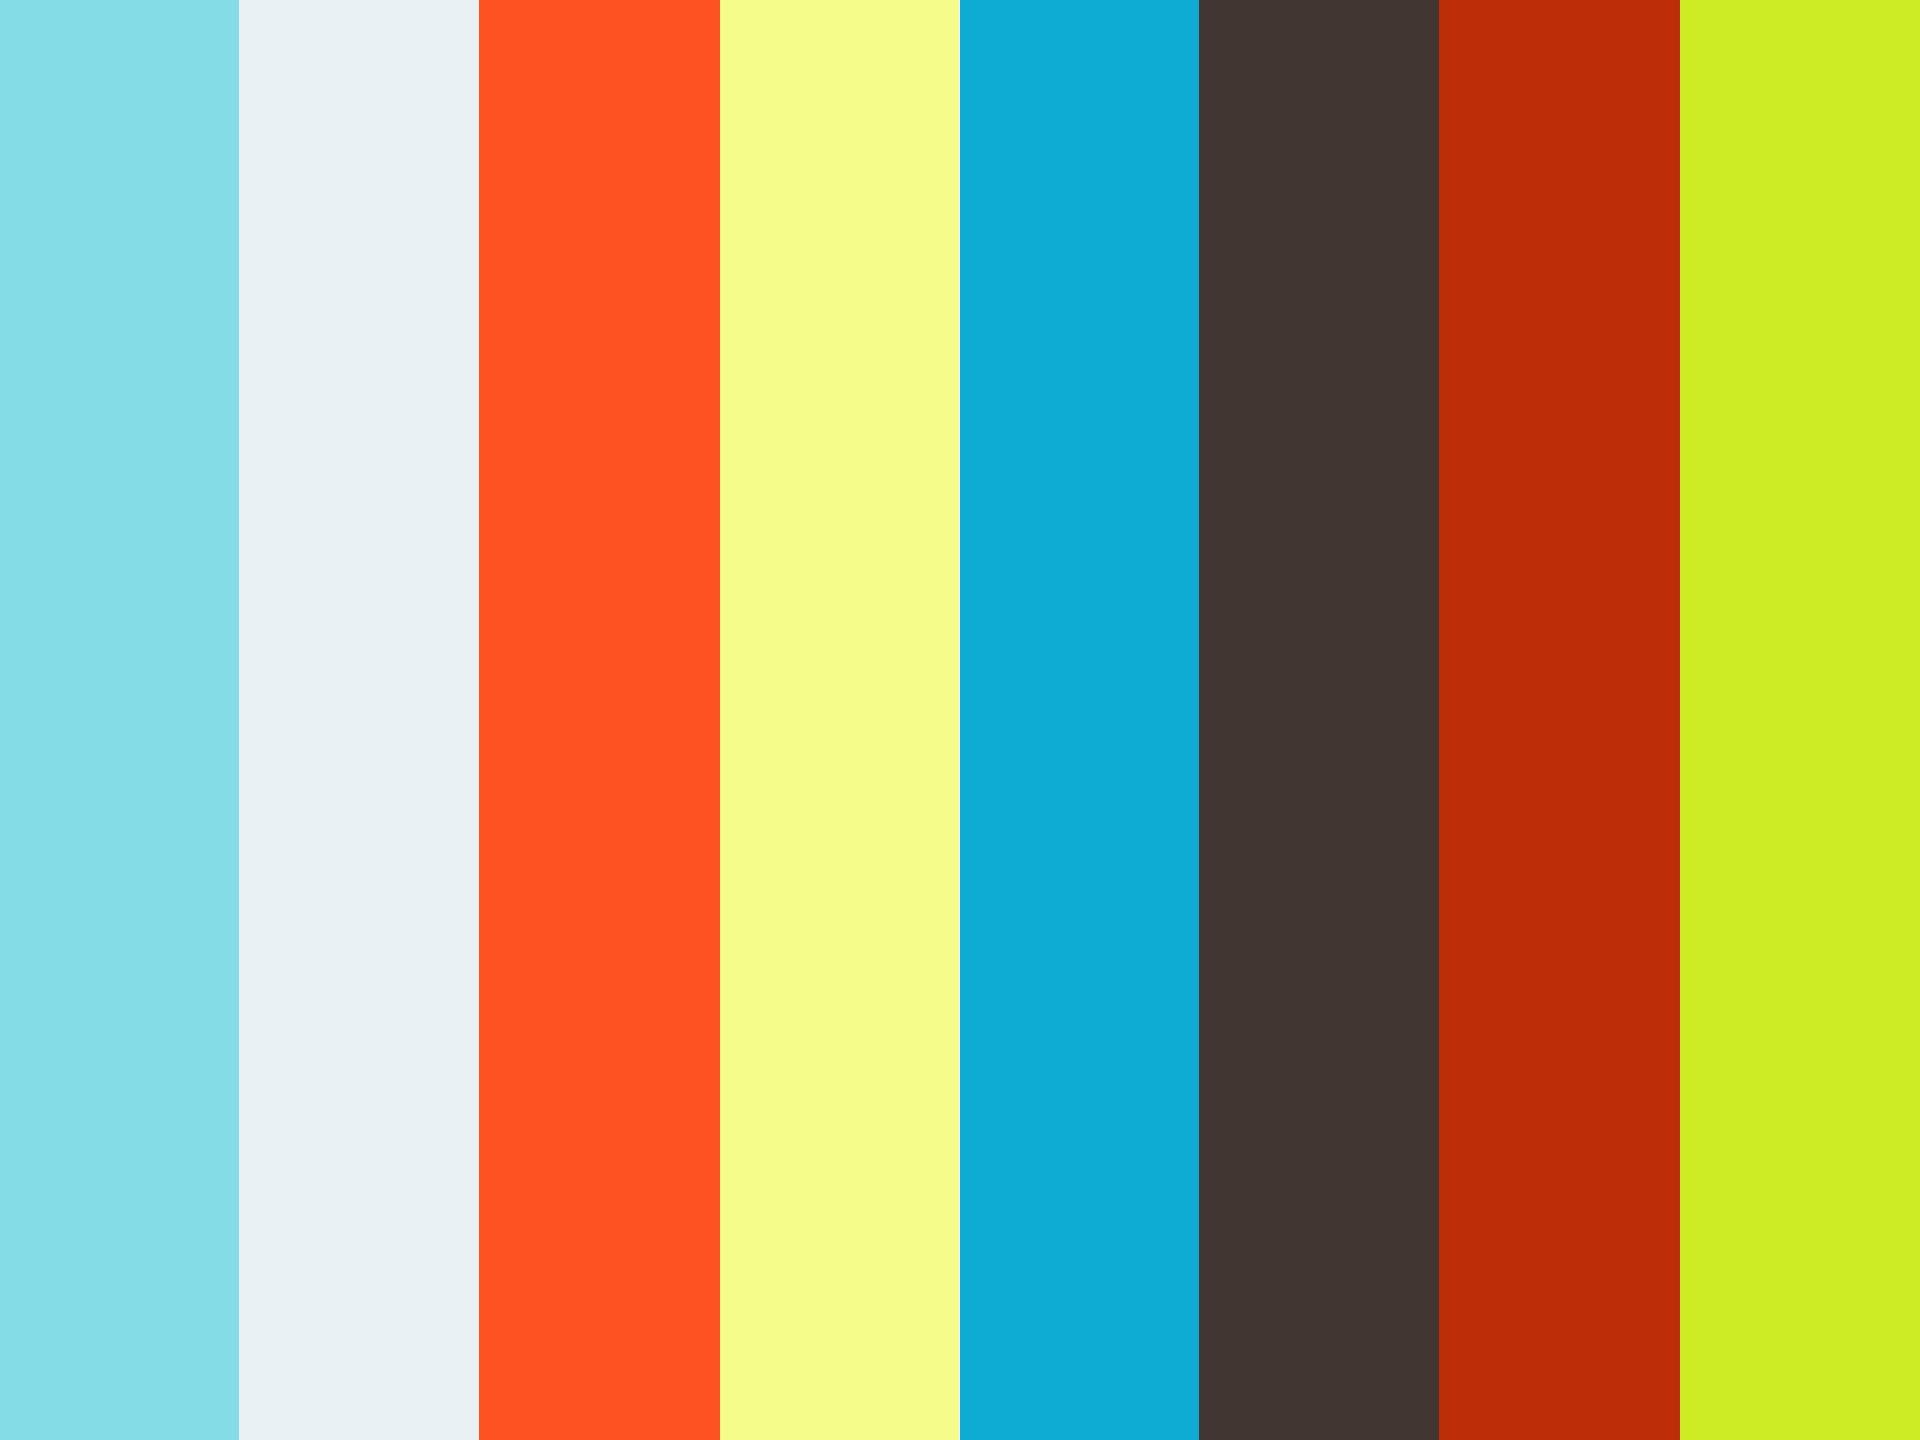 M4 6c Word Problems In Slope Intercept Form On Vimeo